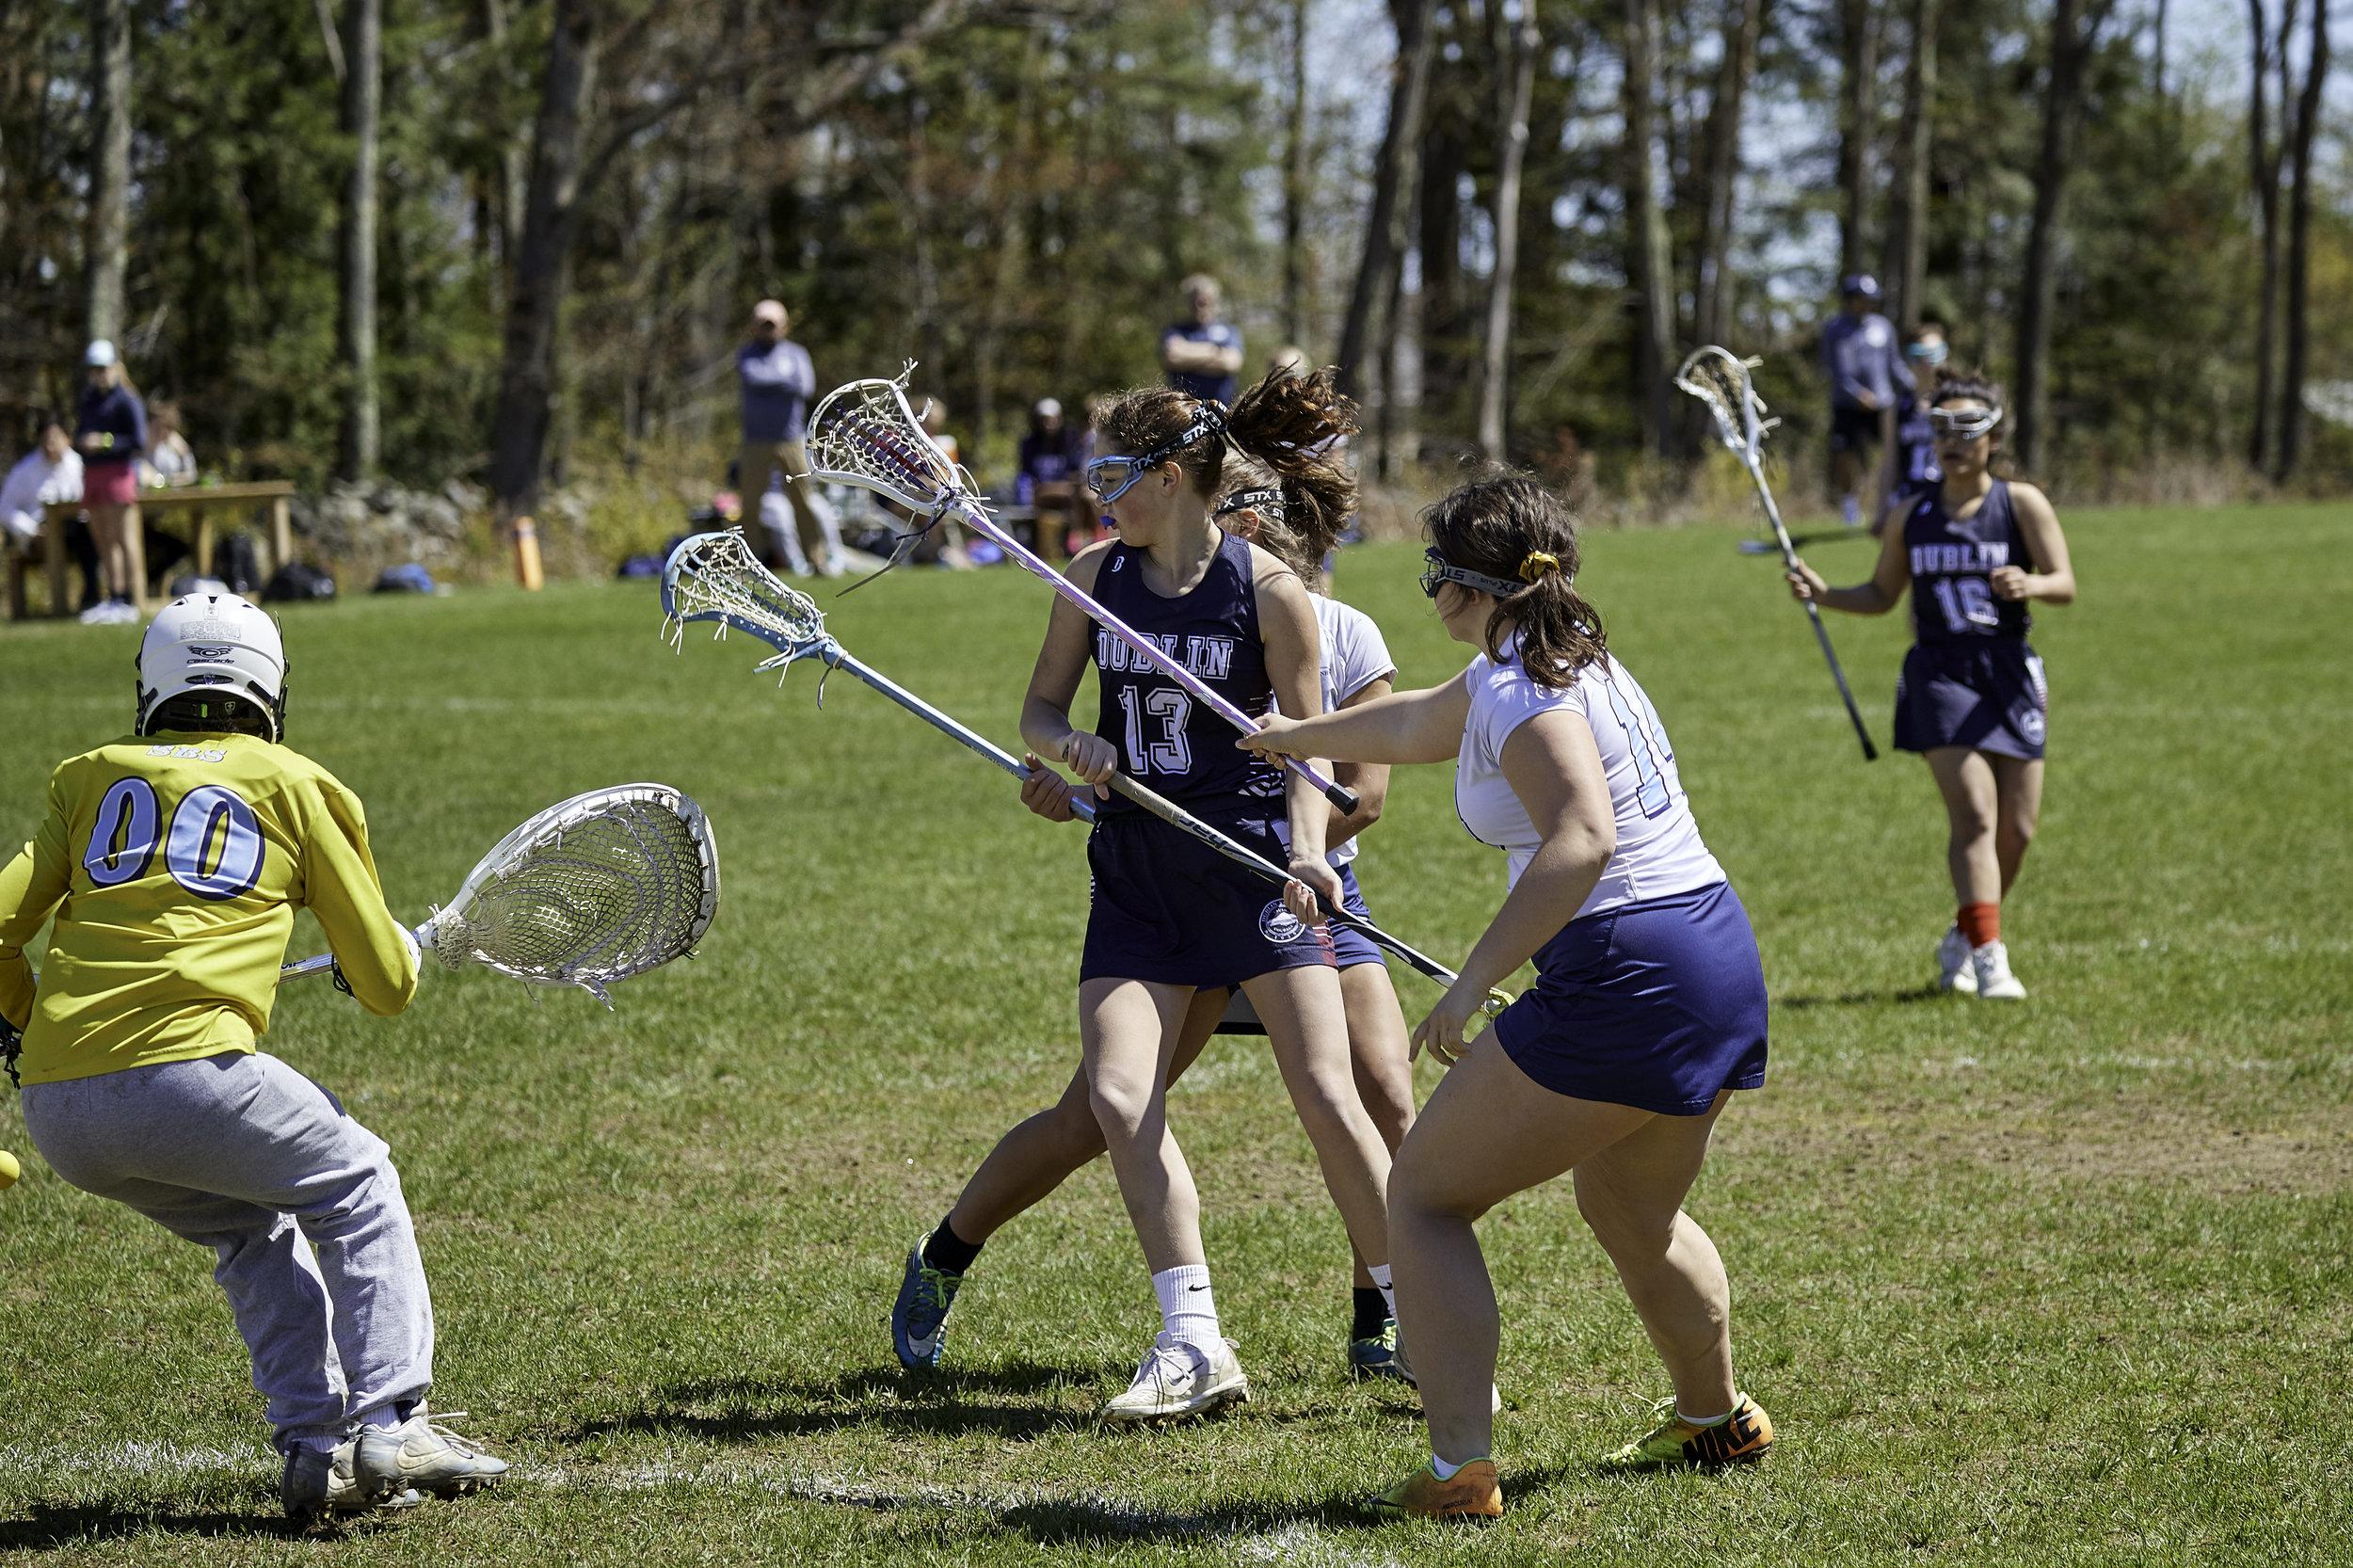 Girls Lacrosse vs. Stoneleigh Burnham School - May 11, 2019 - May 10, 2019193116.jpg